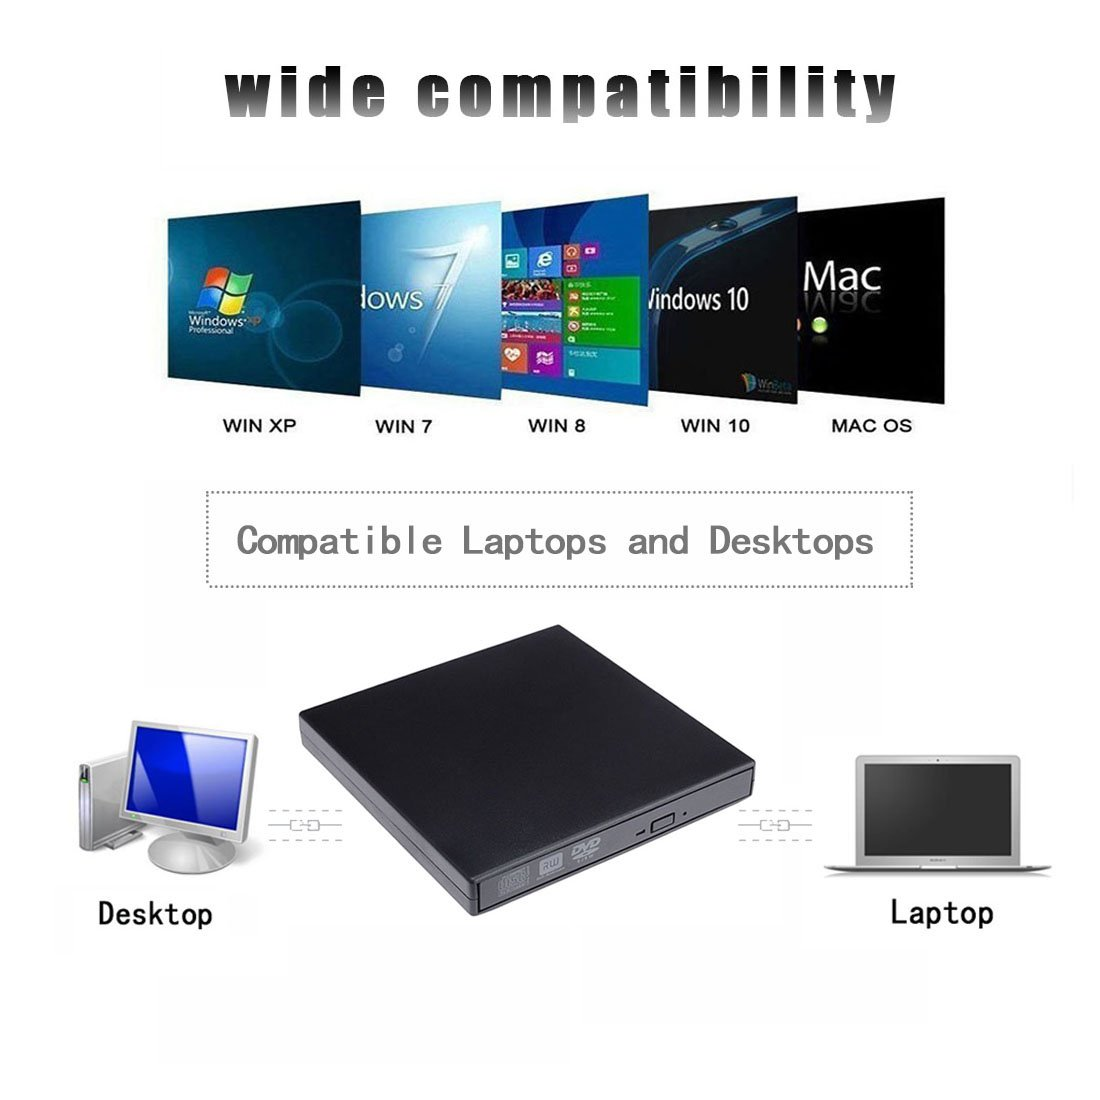 External CD DVD Drive, Sunreal External Optical Drive USB 2.0 DVD/CD Player Portable Slim High Speed Data Transfer DVD Drive for PC Computer Laptop Desktops with Windows Mac OS(Black) by Sunreal (Image #2)